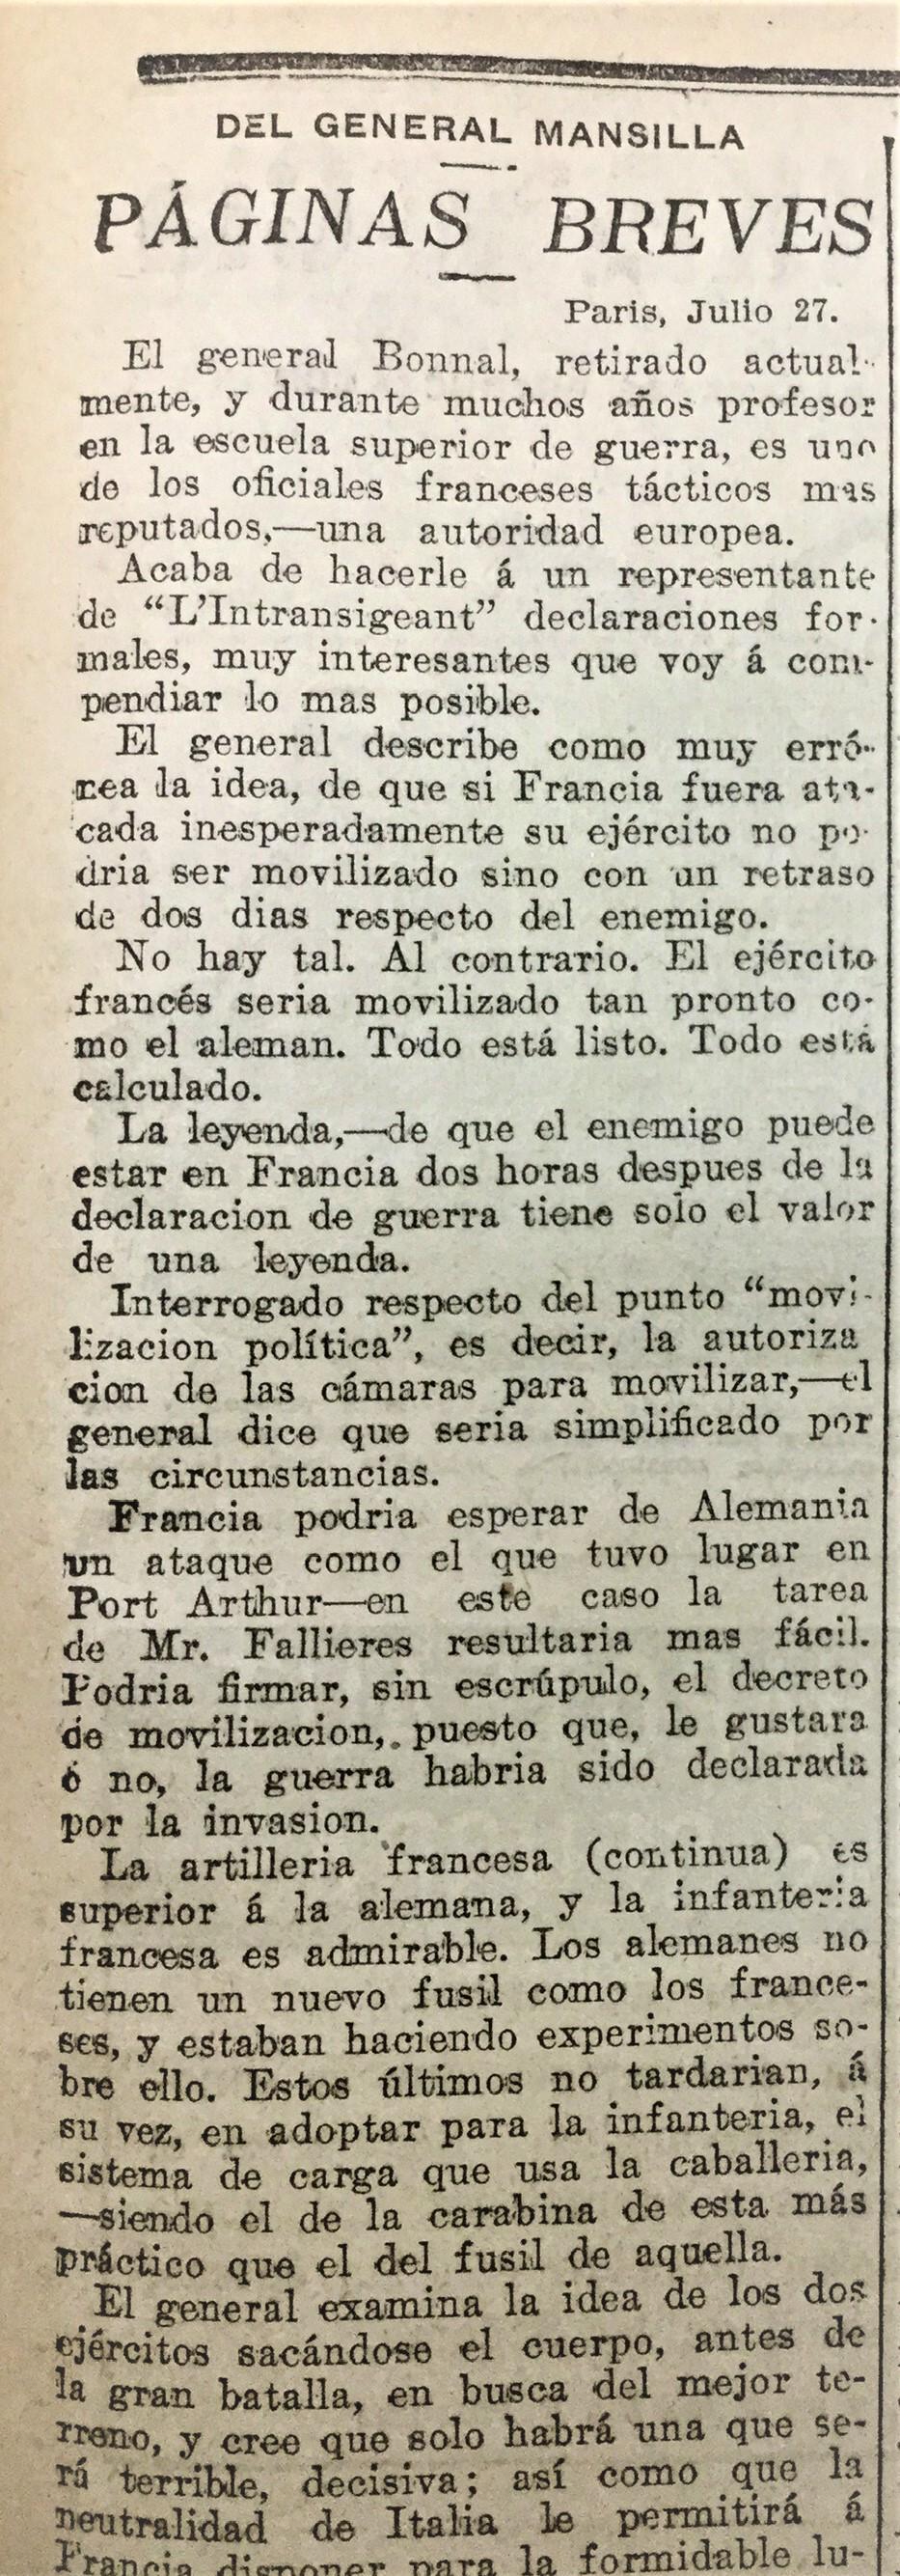 C:UsersnataliaDesktopLucioPAGINAS BREVES.FotosPaginas breves.1908PB.1908.07.JULIOIMG-4320.jpg